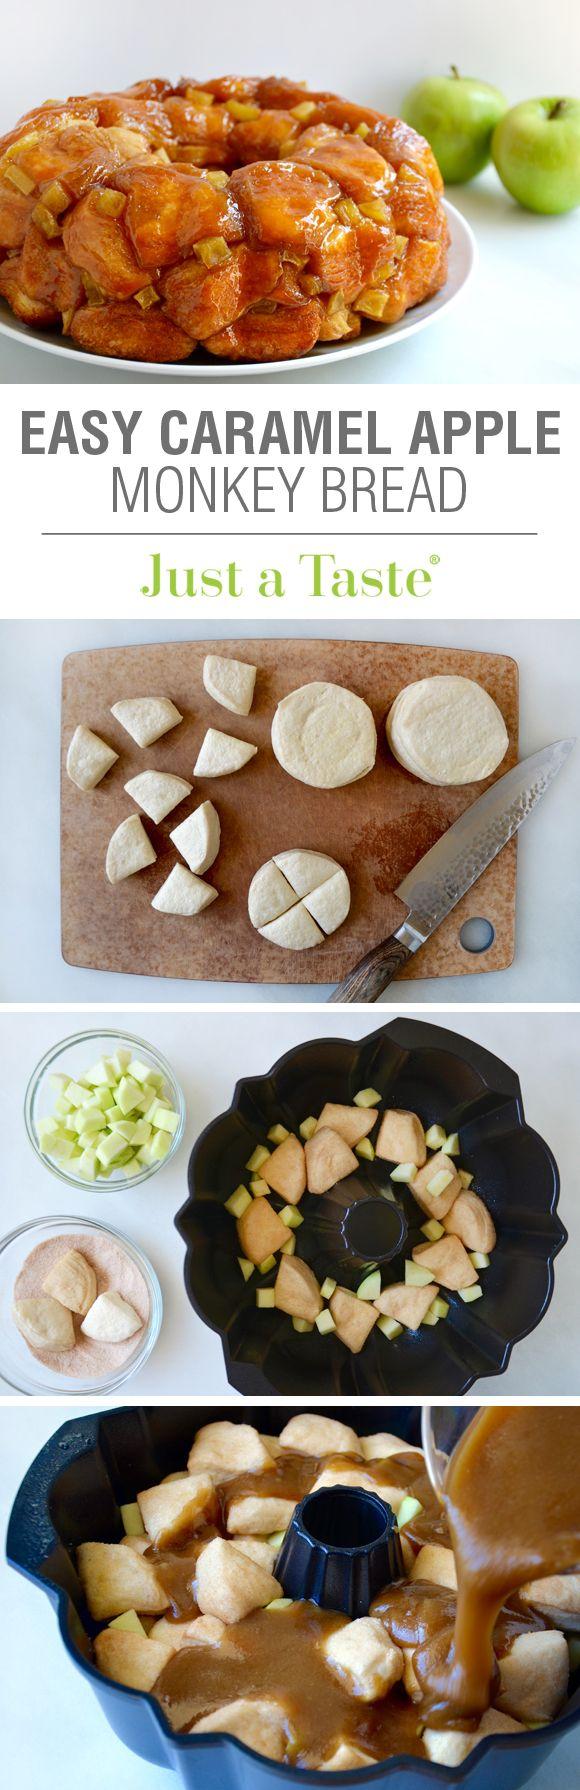 Easy Caramel Apple Monkey Bread #recipe via justataste.com